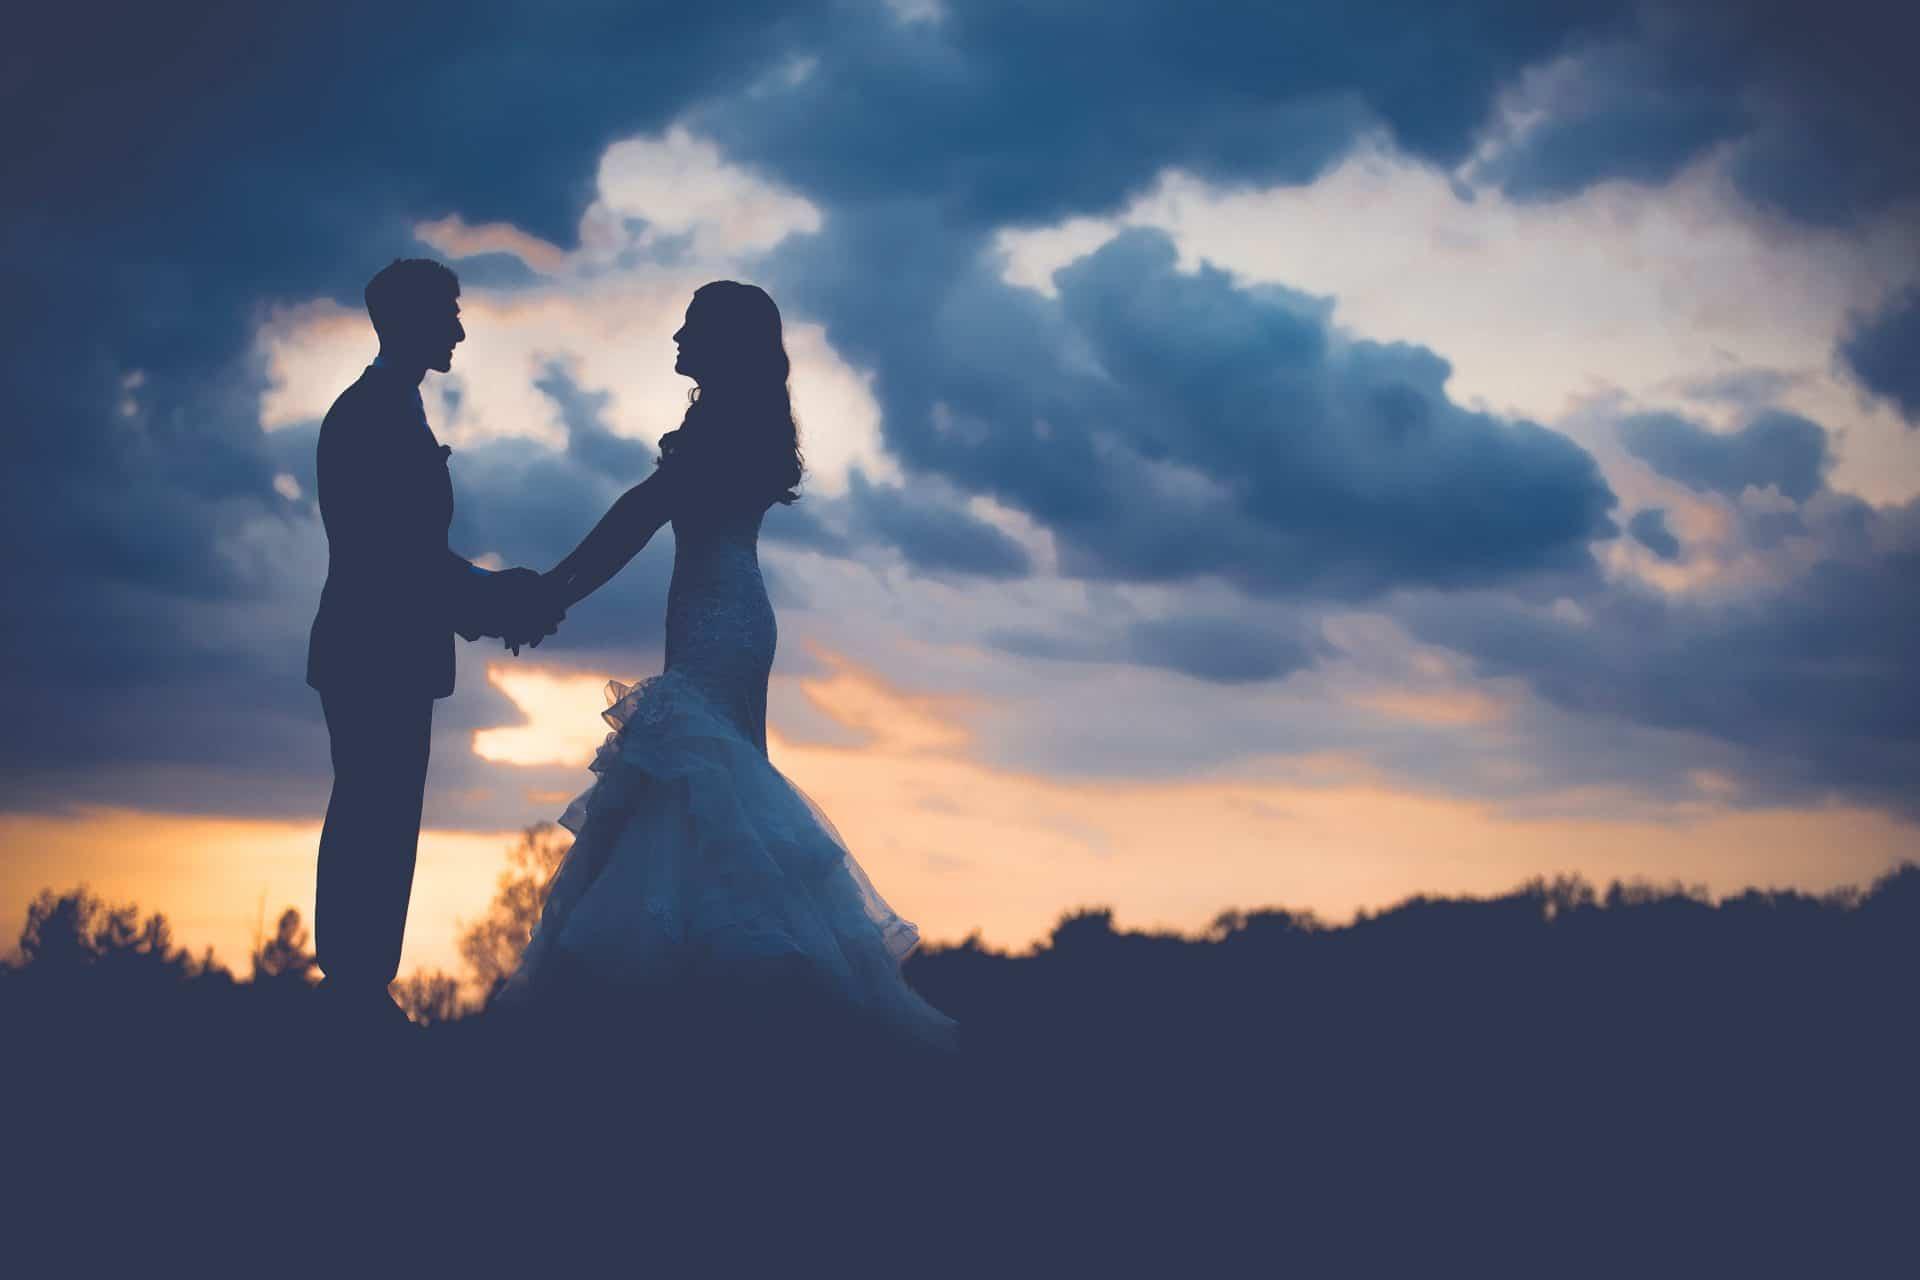 matrimonio bohemienne a sorrento ed in costiera amalfitana